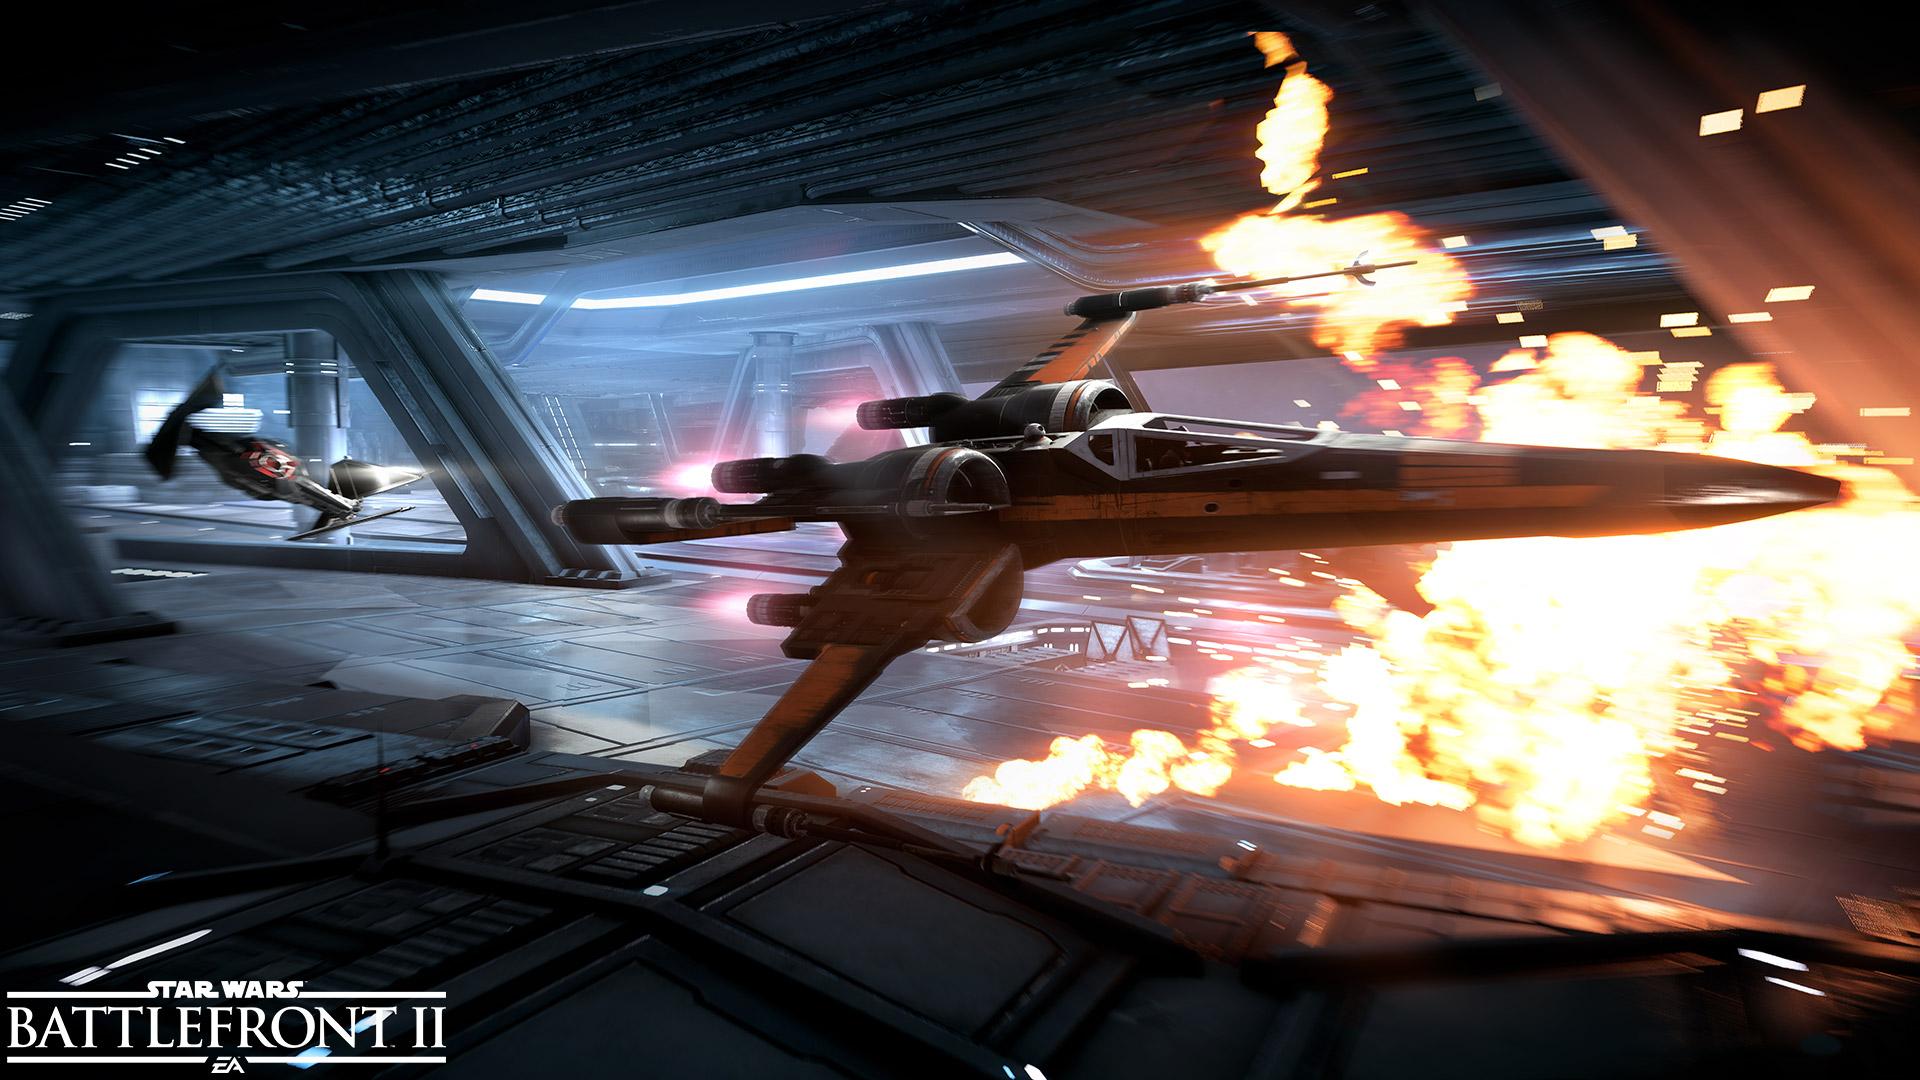 Star Wars Battlefront 2 wallpaper 11